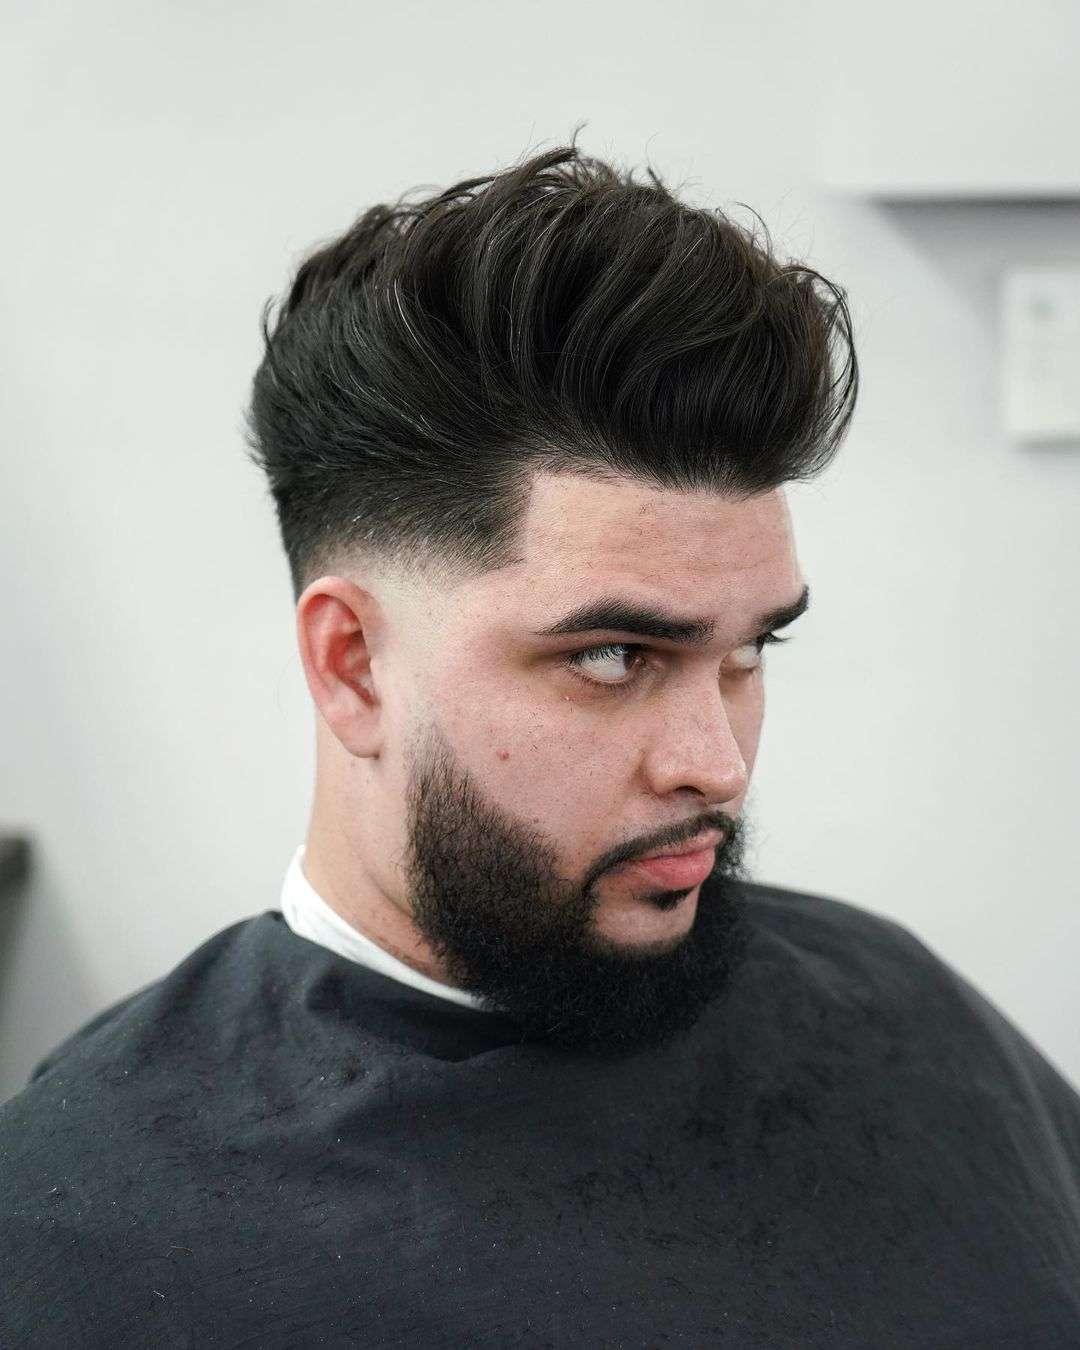 fryzura męska długa góra krótkie boki